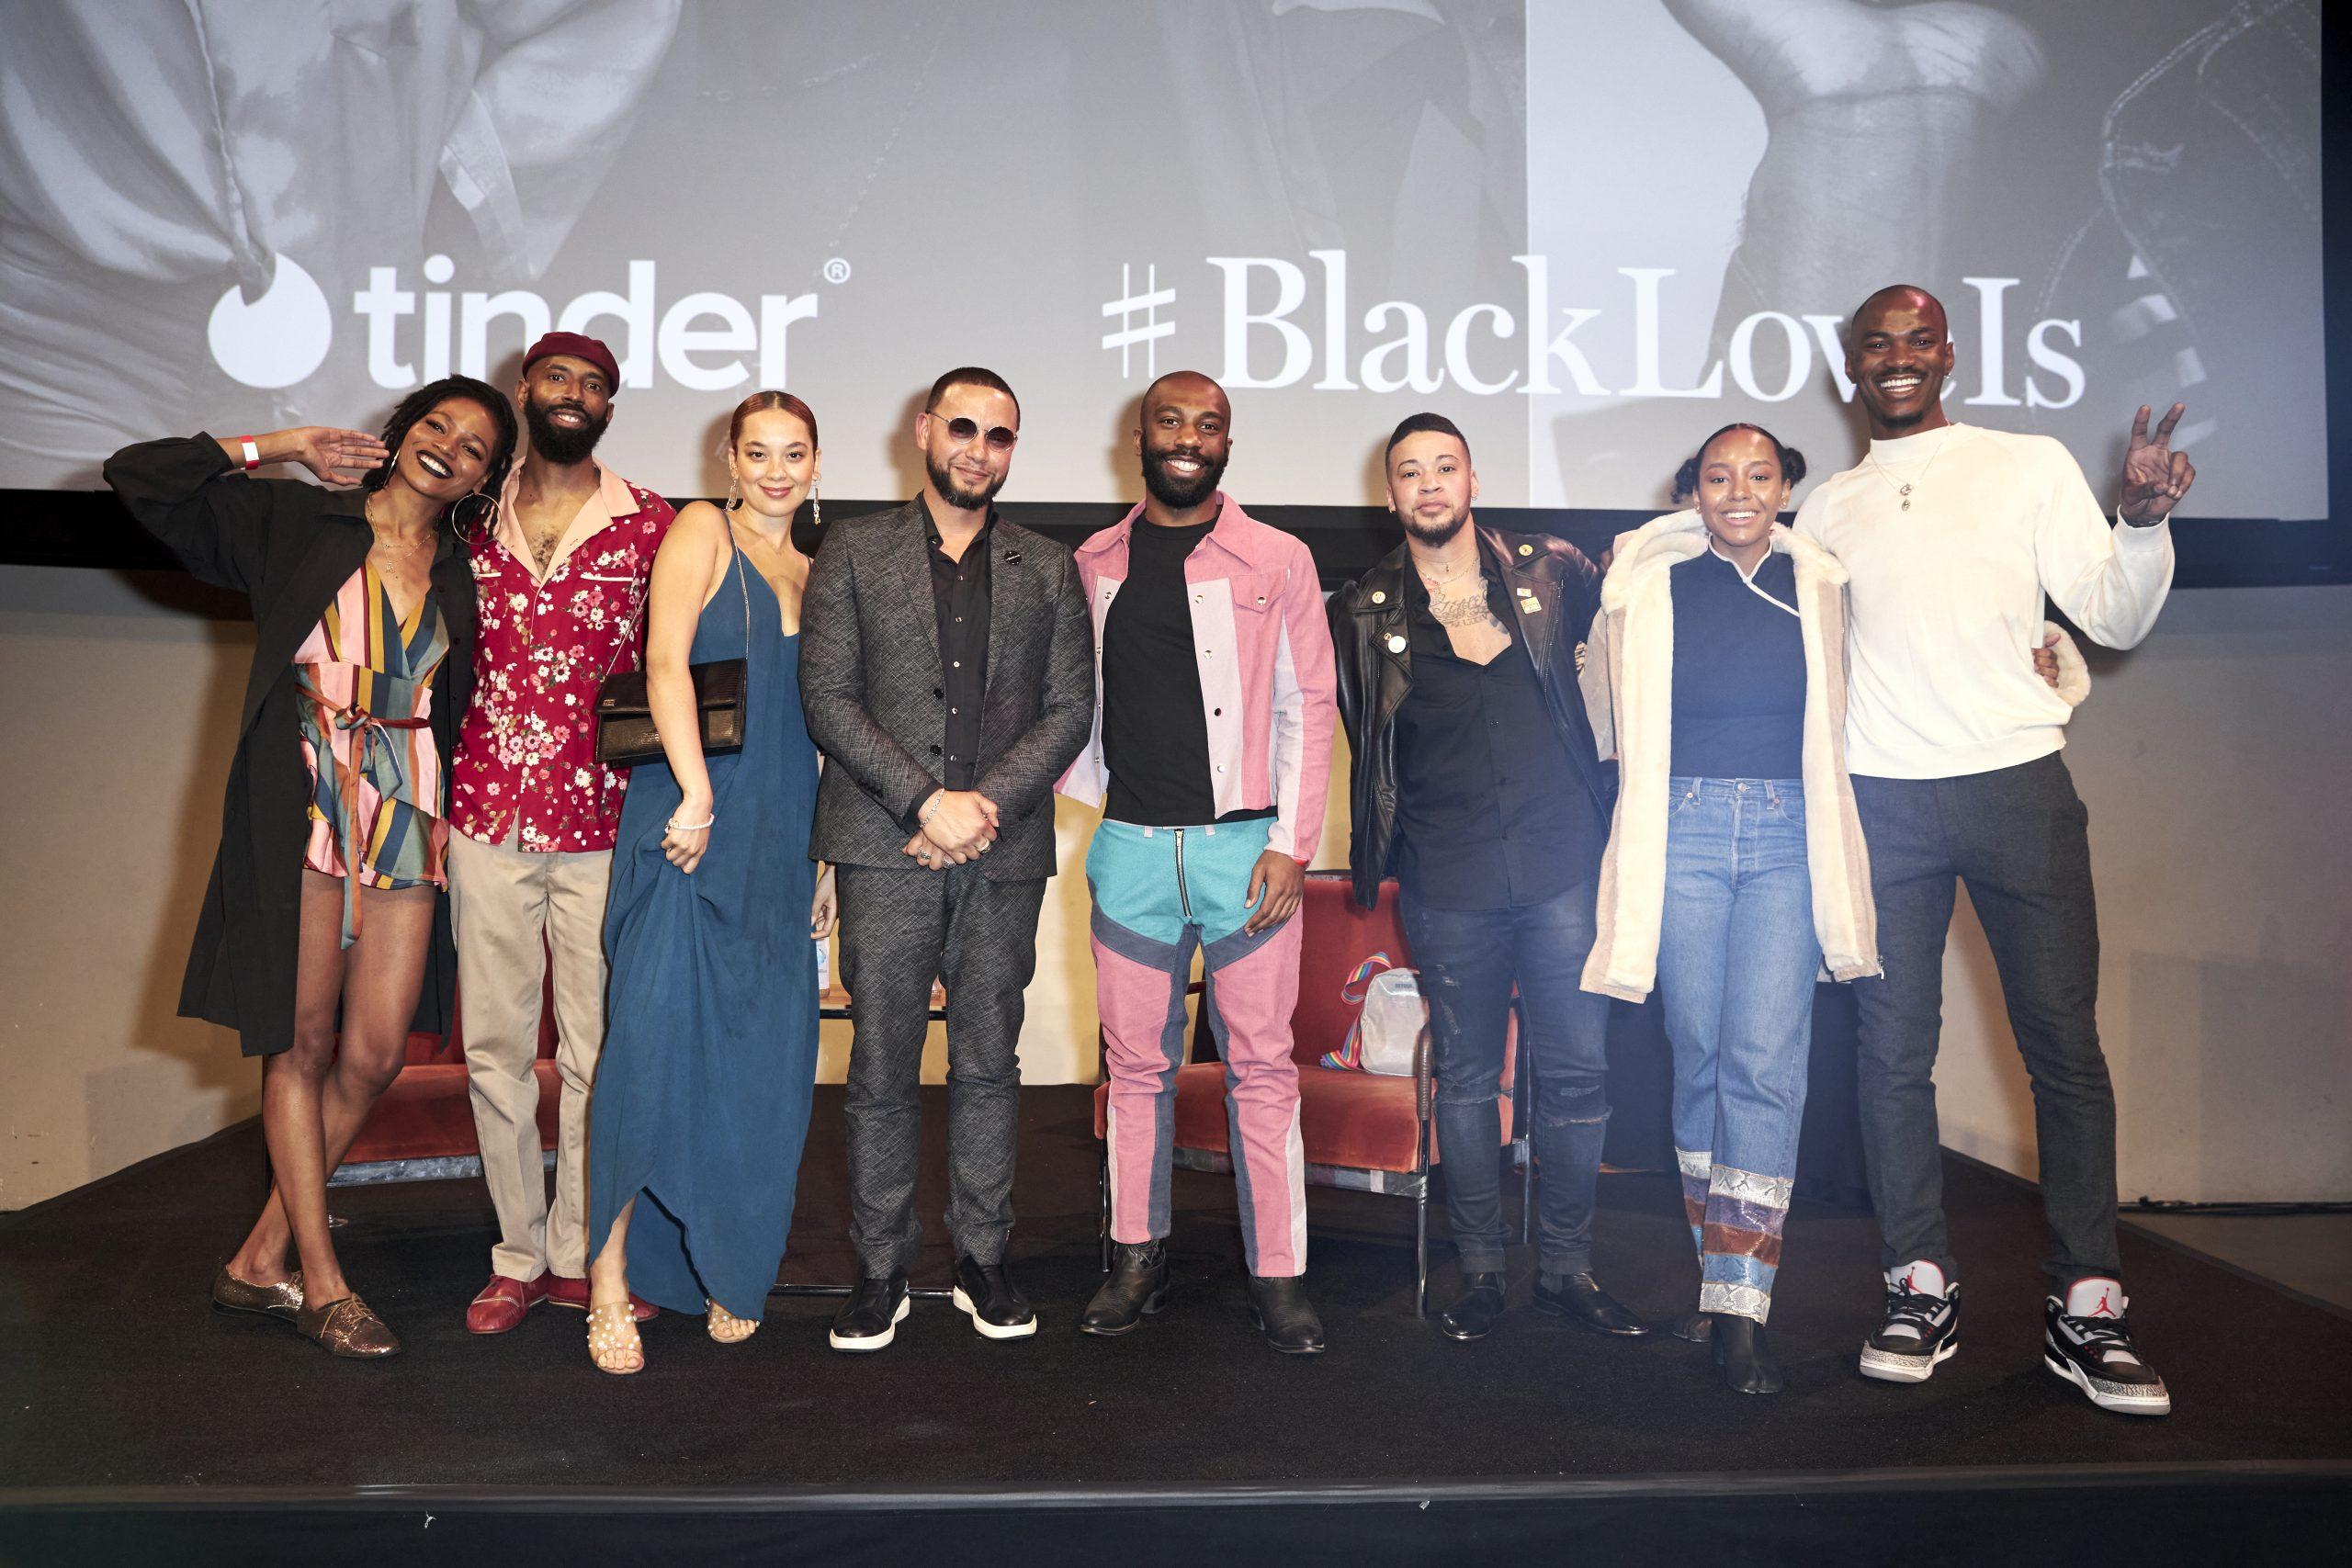 blackloveis, tinder, director x